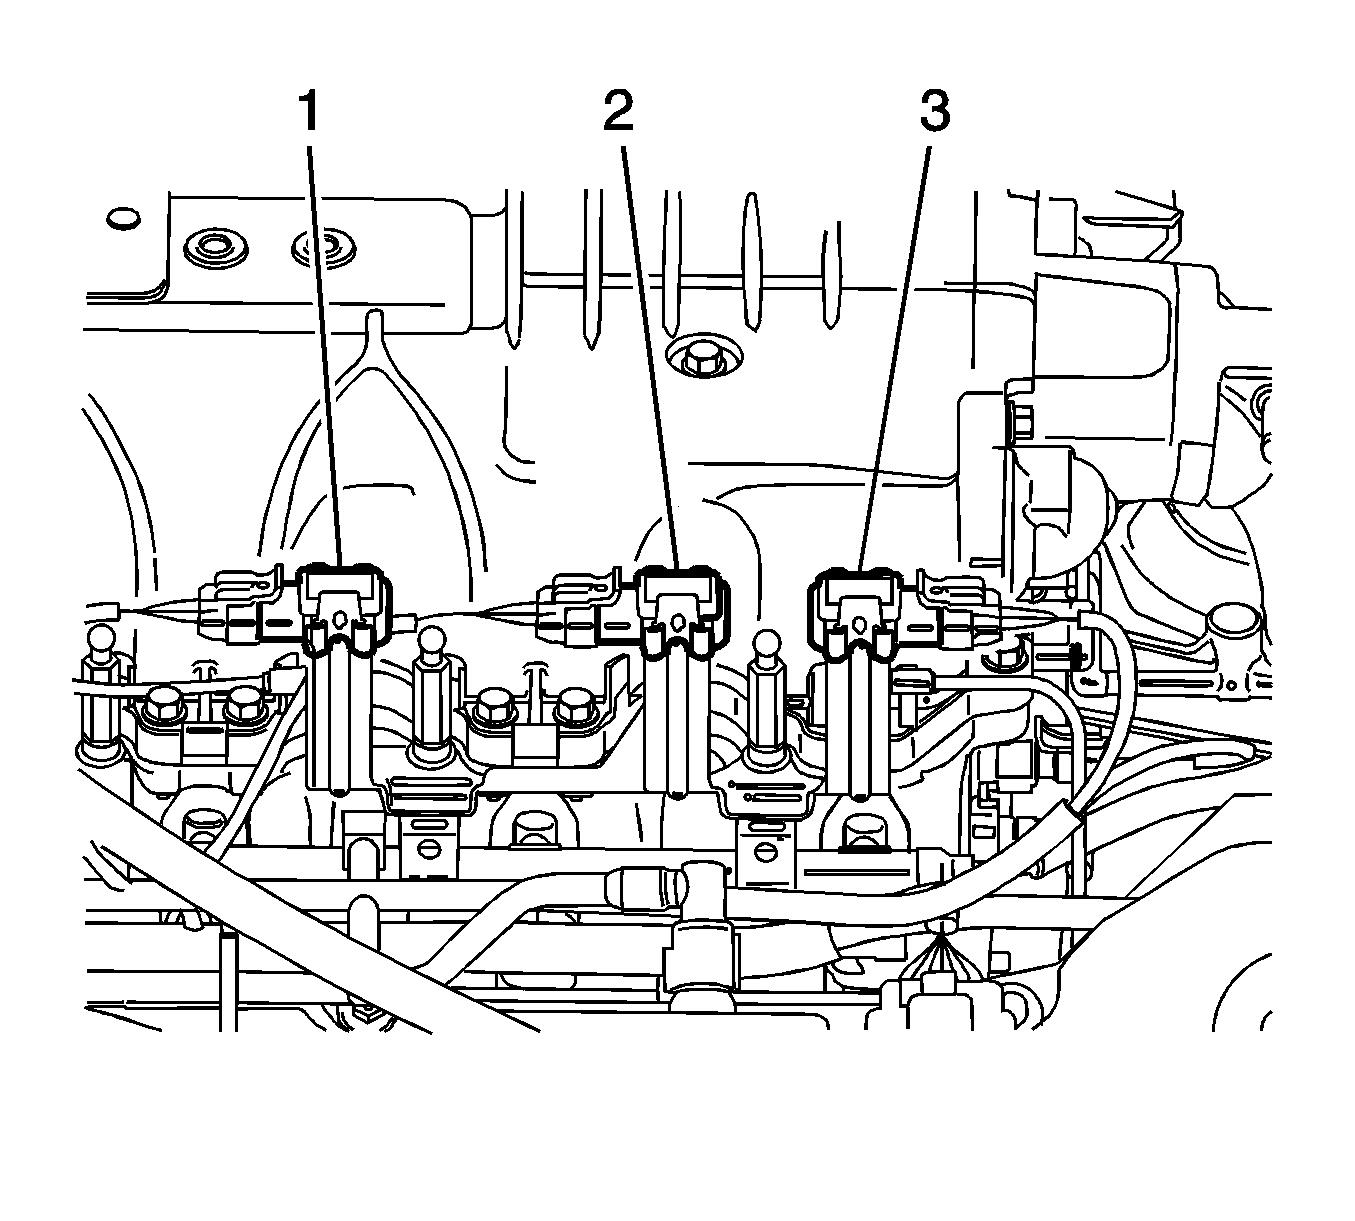 [KF_4390] 2006 Cadillac Cts Engine Diagram Schematic Wiring